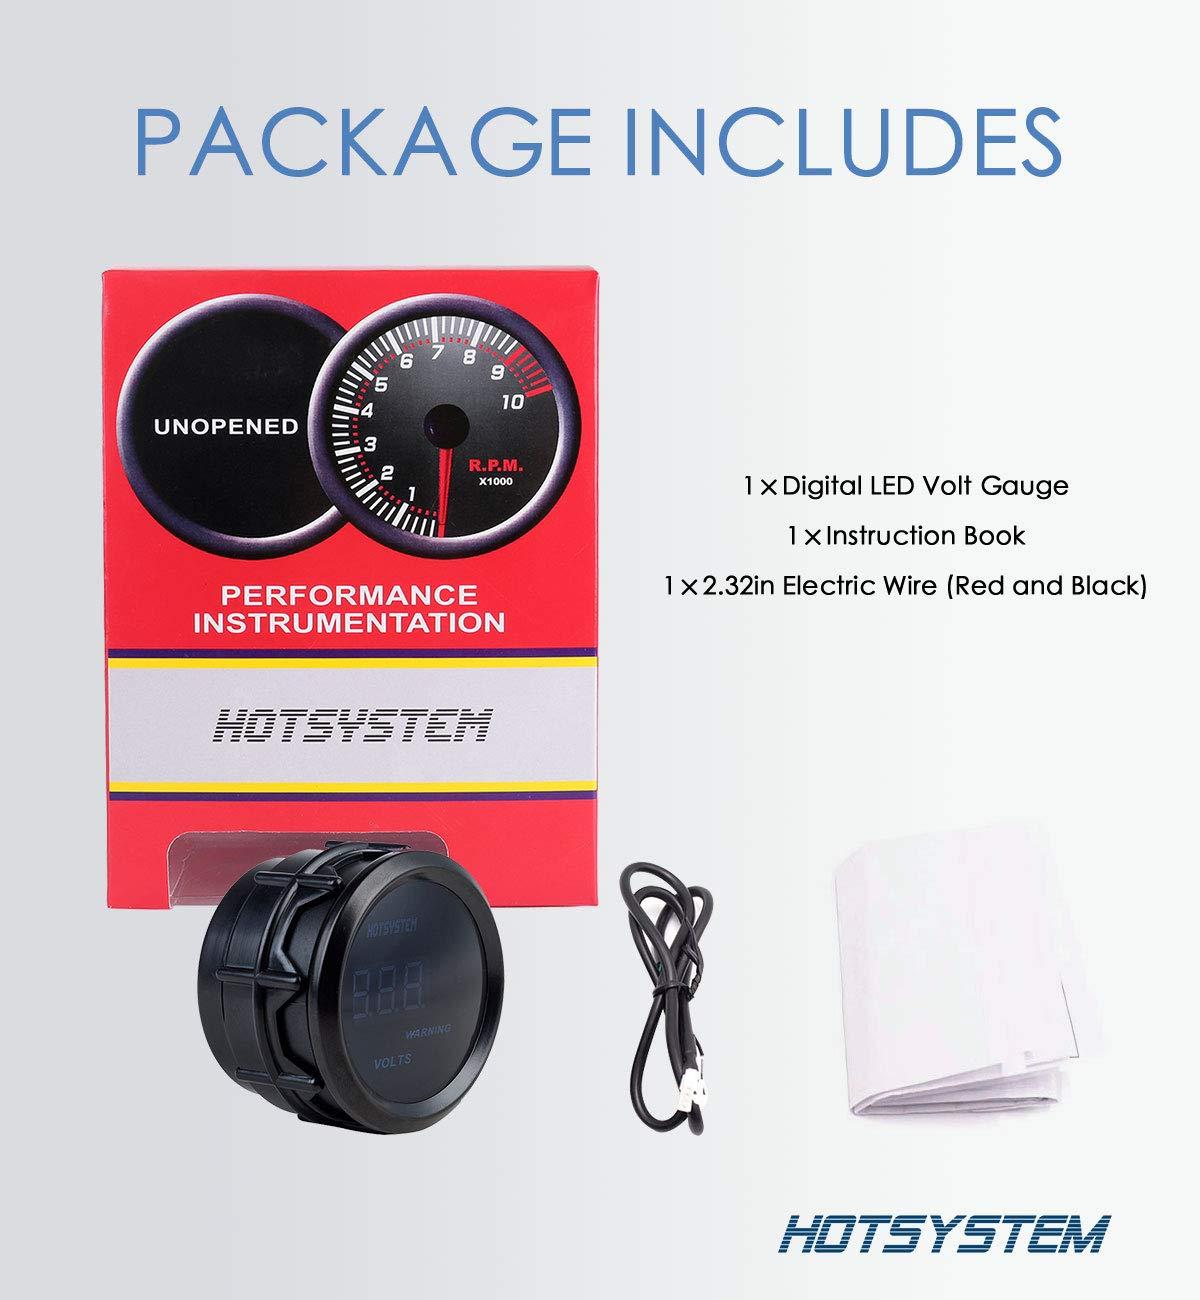 HOTSYSTEM Electronic Voltmeter Voltage Volt Gauge Meter Blue Digital LED 2inches 52mm for Car Vehicle Auto